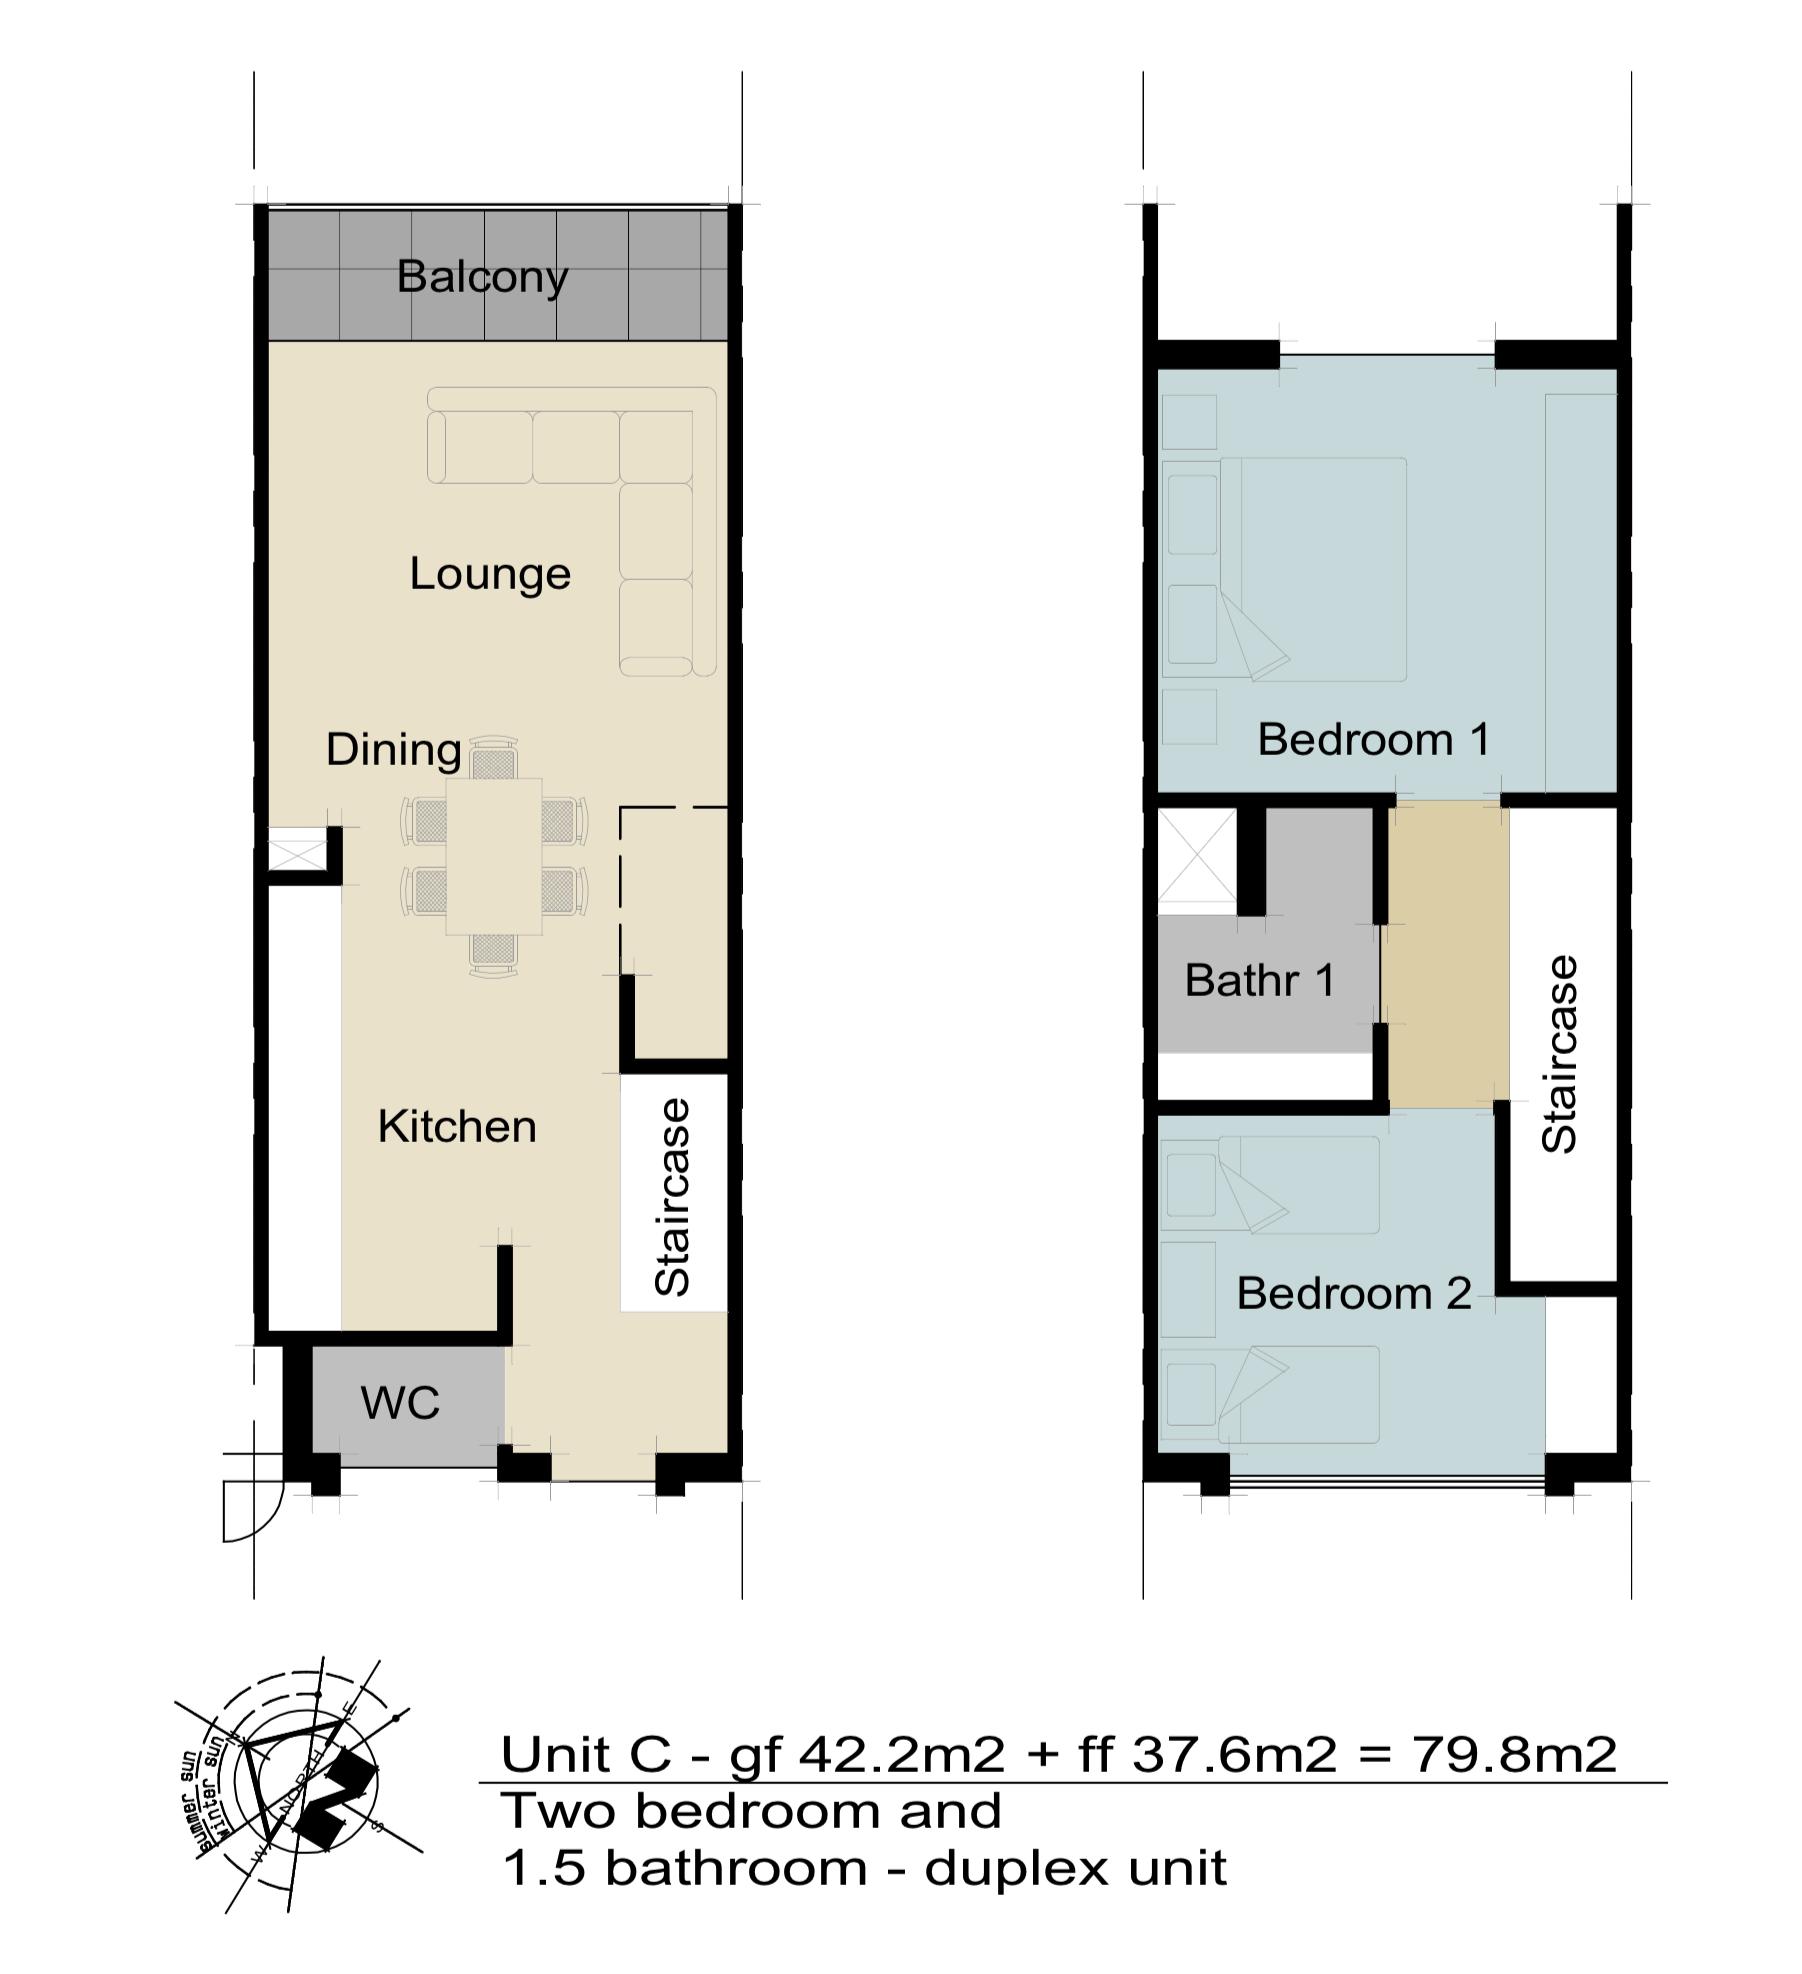 Menlo Park Apartments: 2 Bedroom Apartment For Sale In Menlo Park